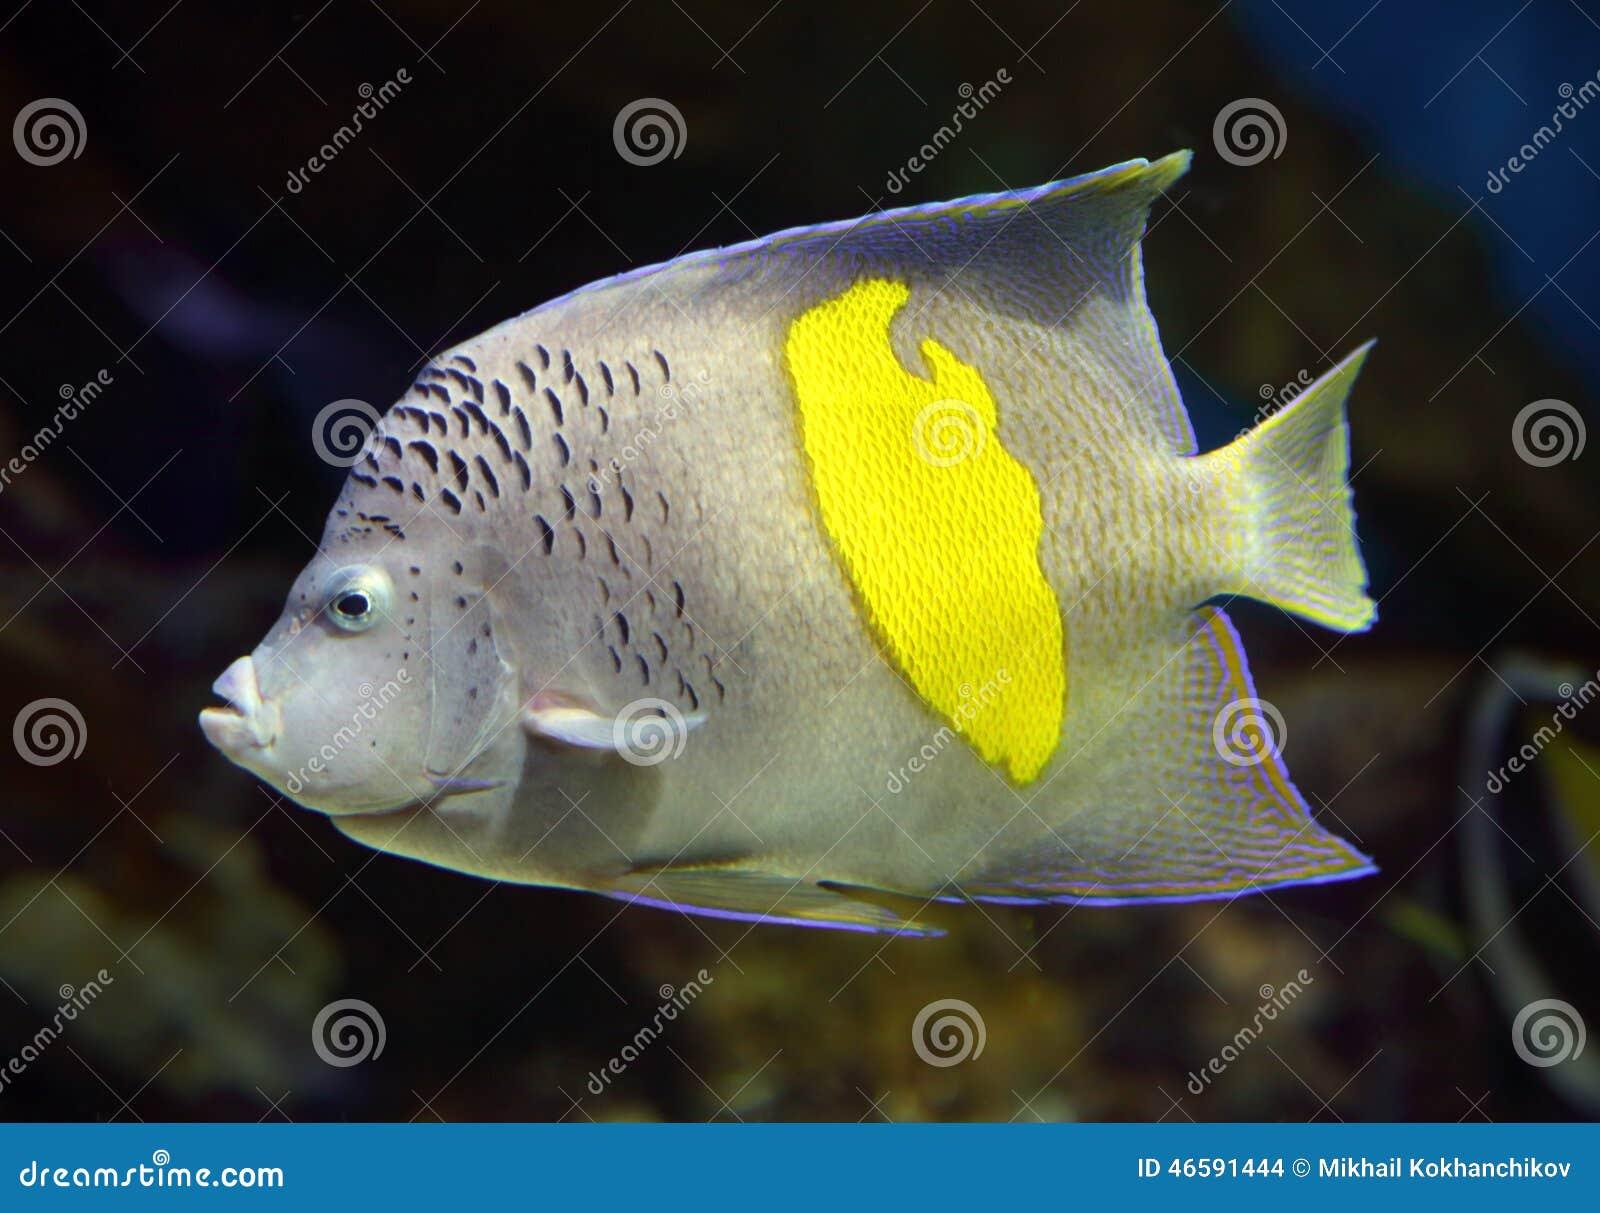 Angelfish - Pomacanthus, maculosus